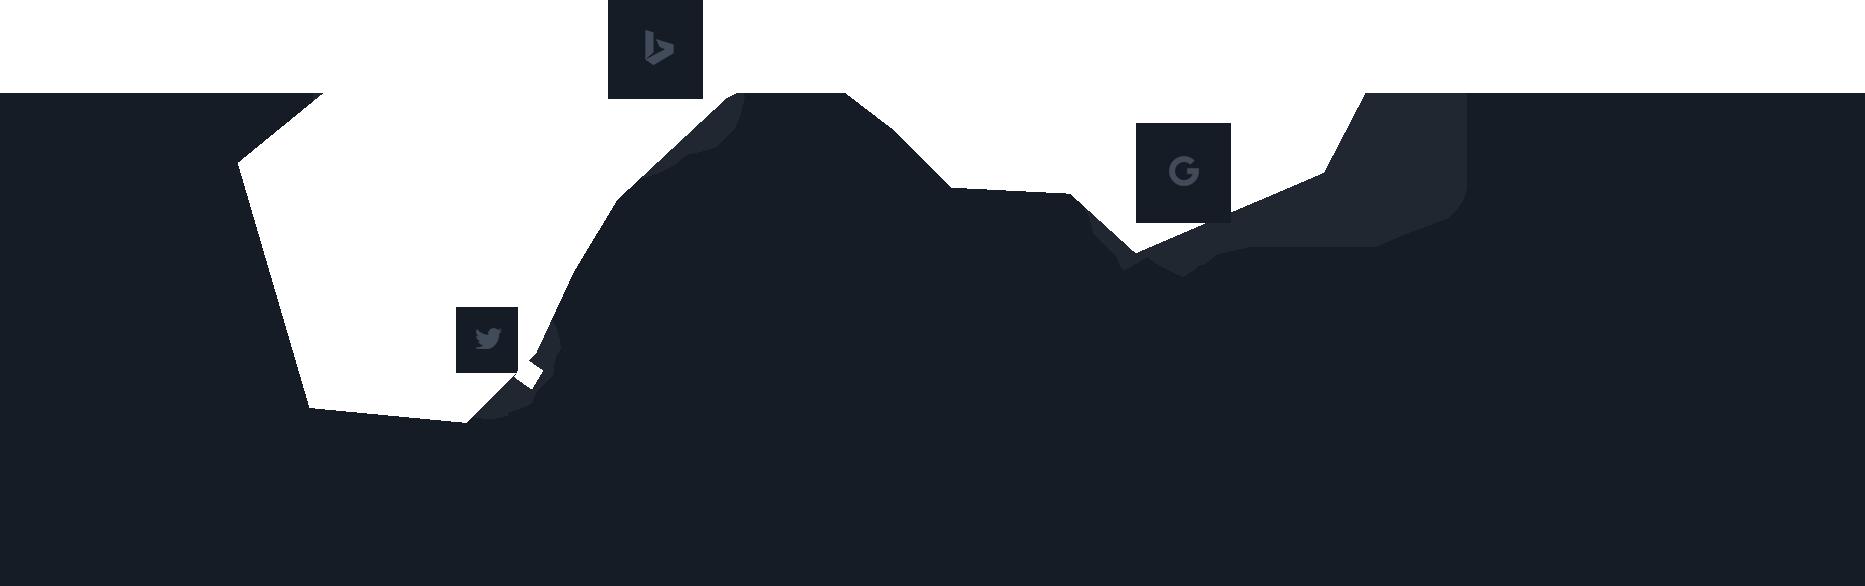 Social City Image